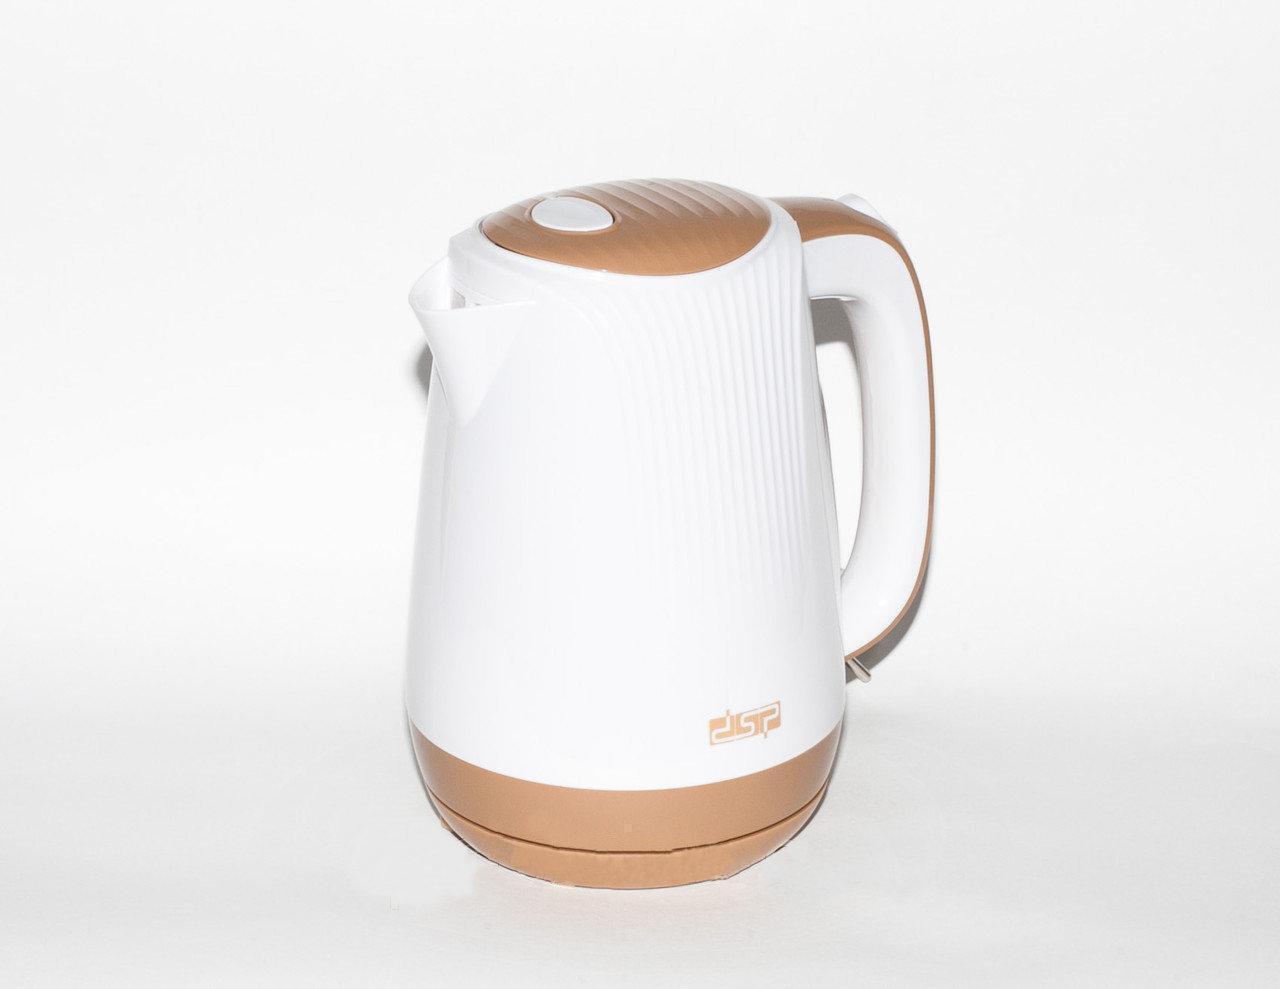 Чайник DSP KK1002